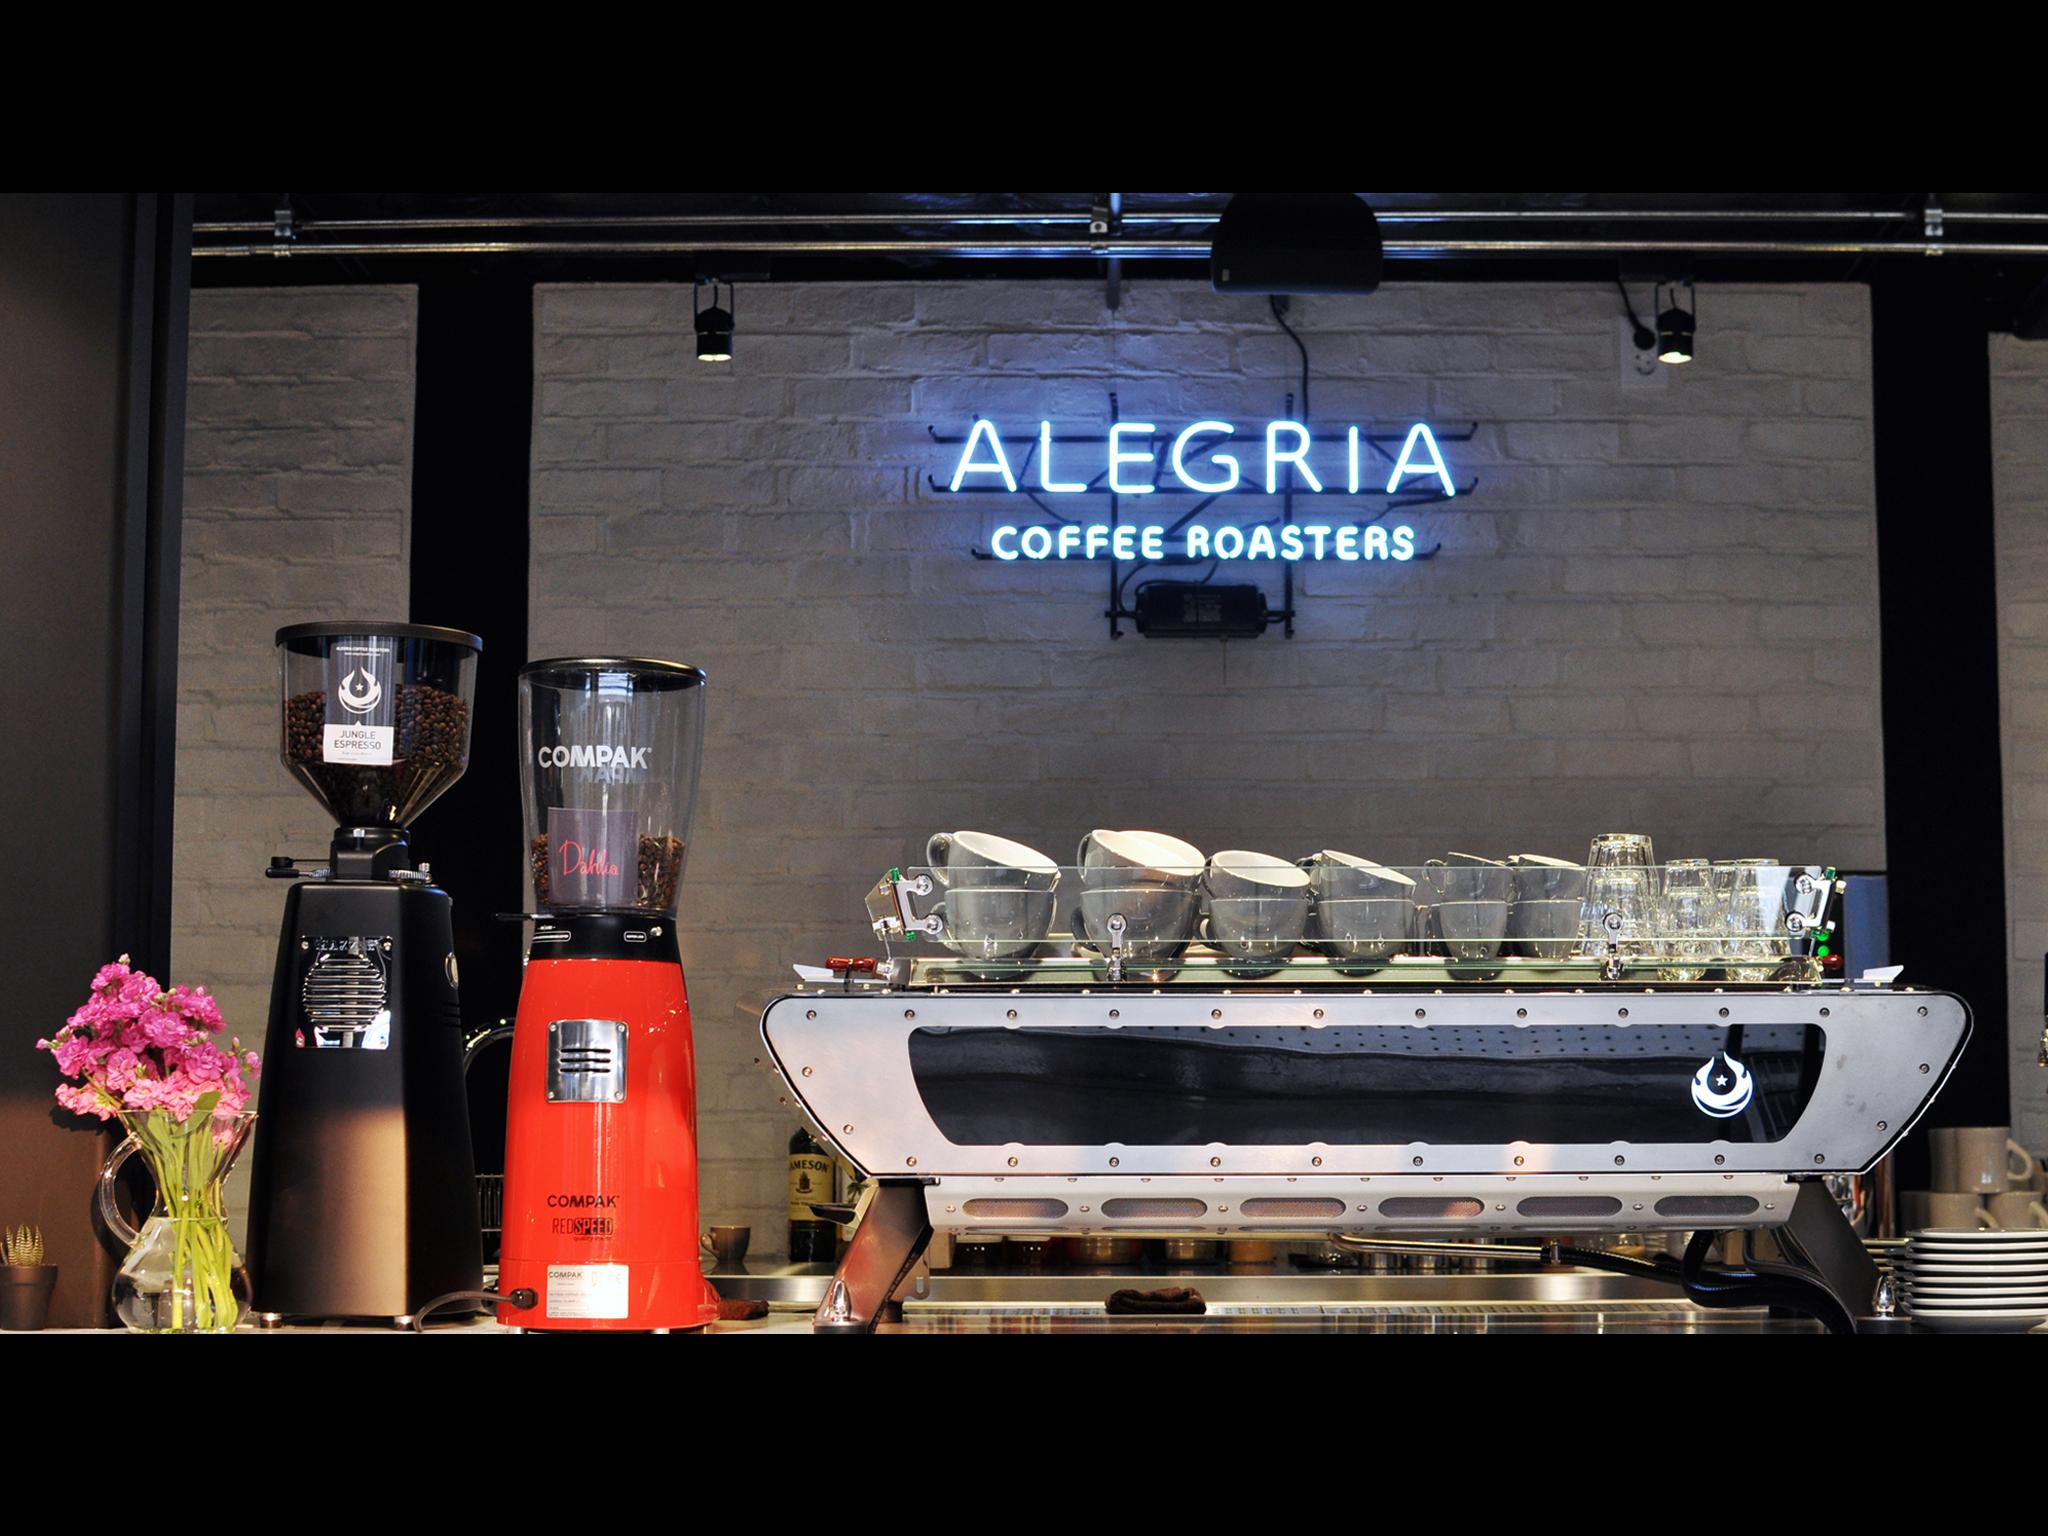 Alegeria Coffee